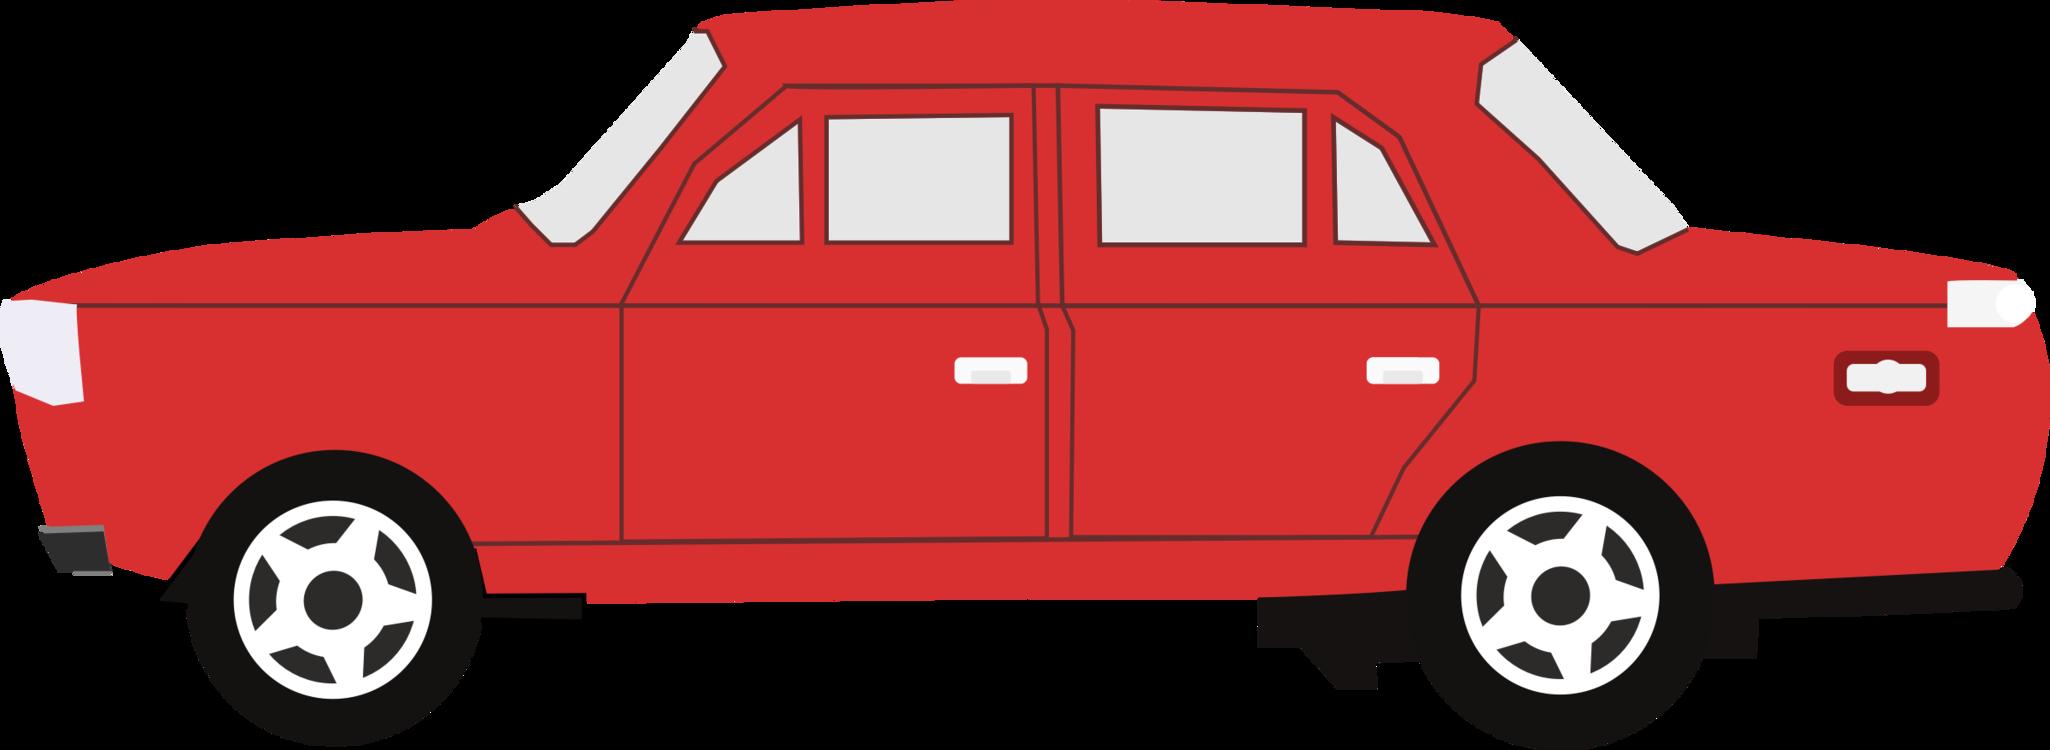 Family Car,Van,Compact Car